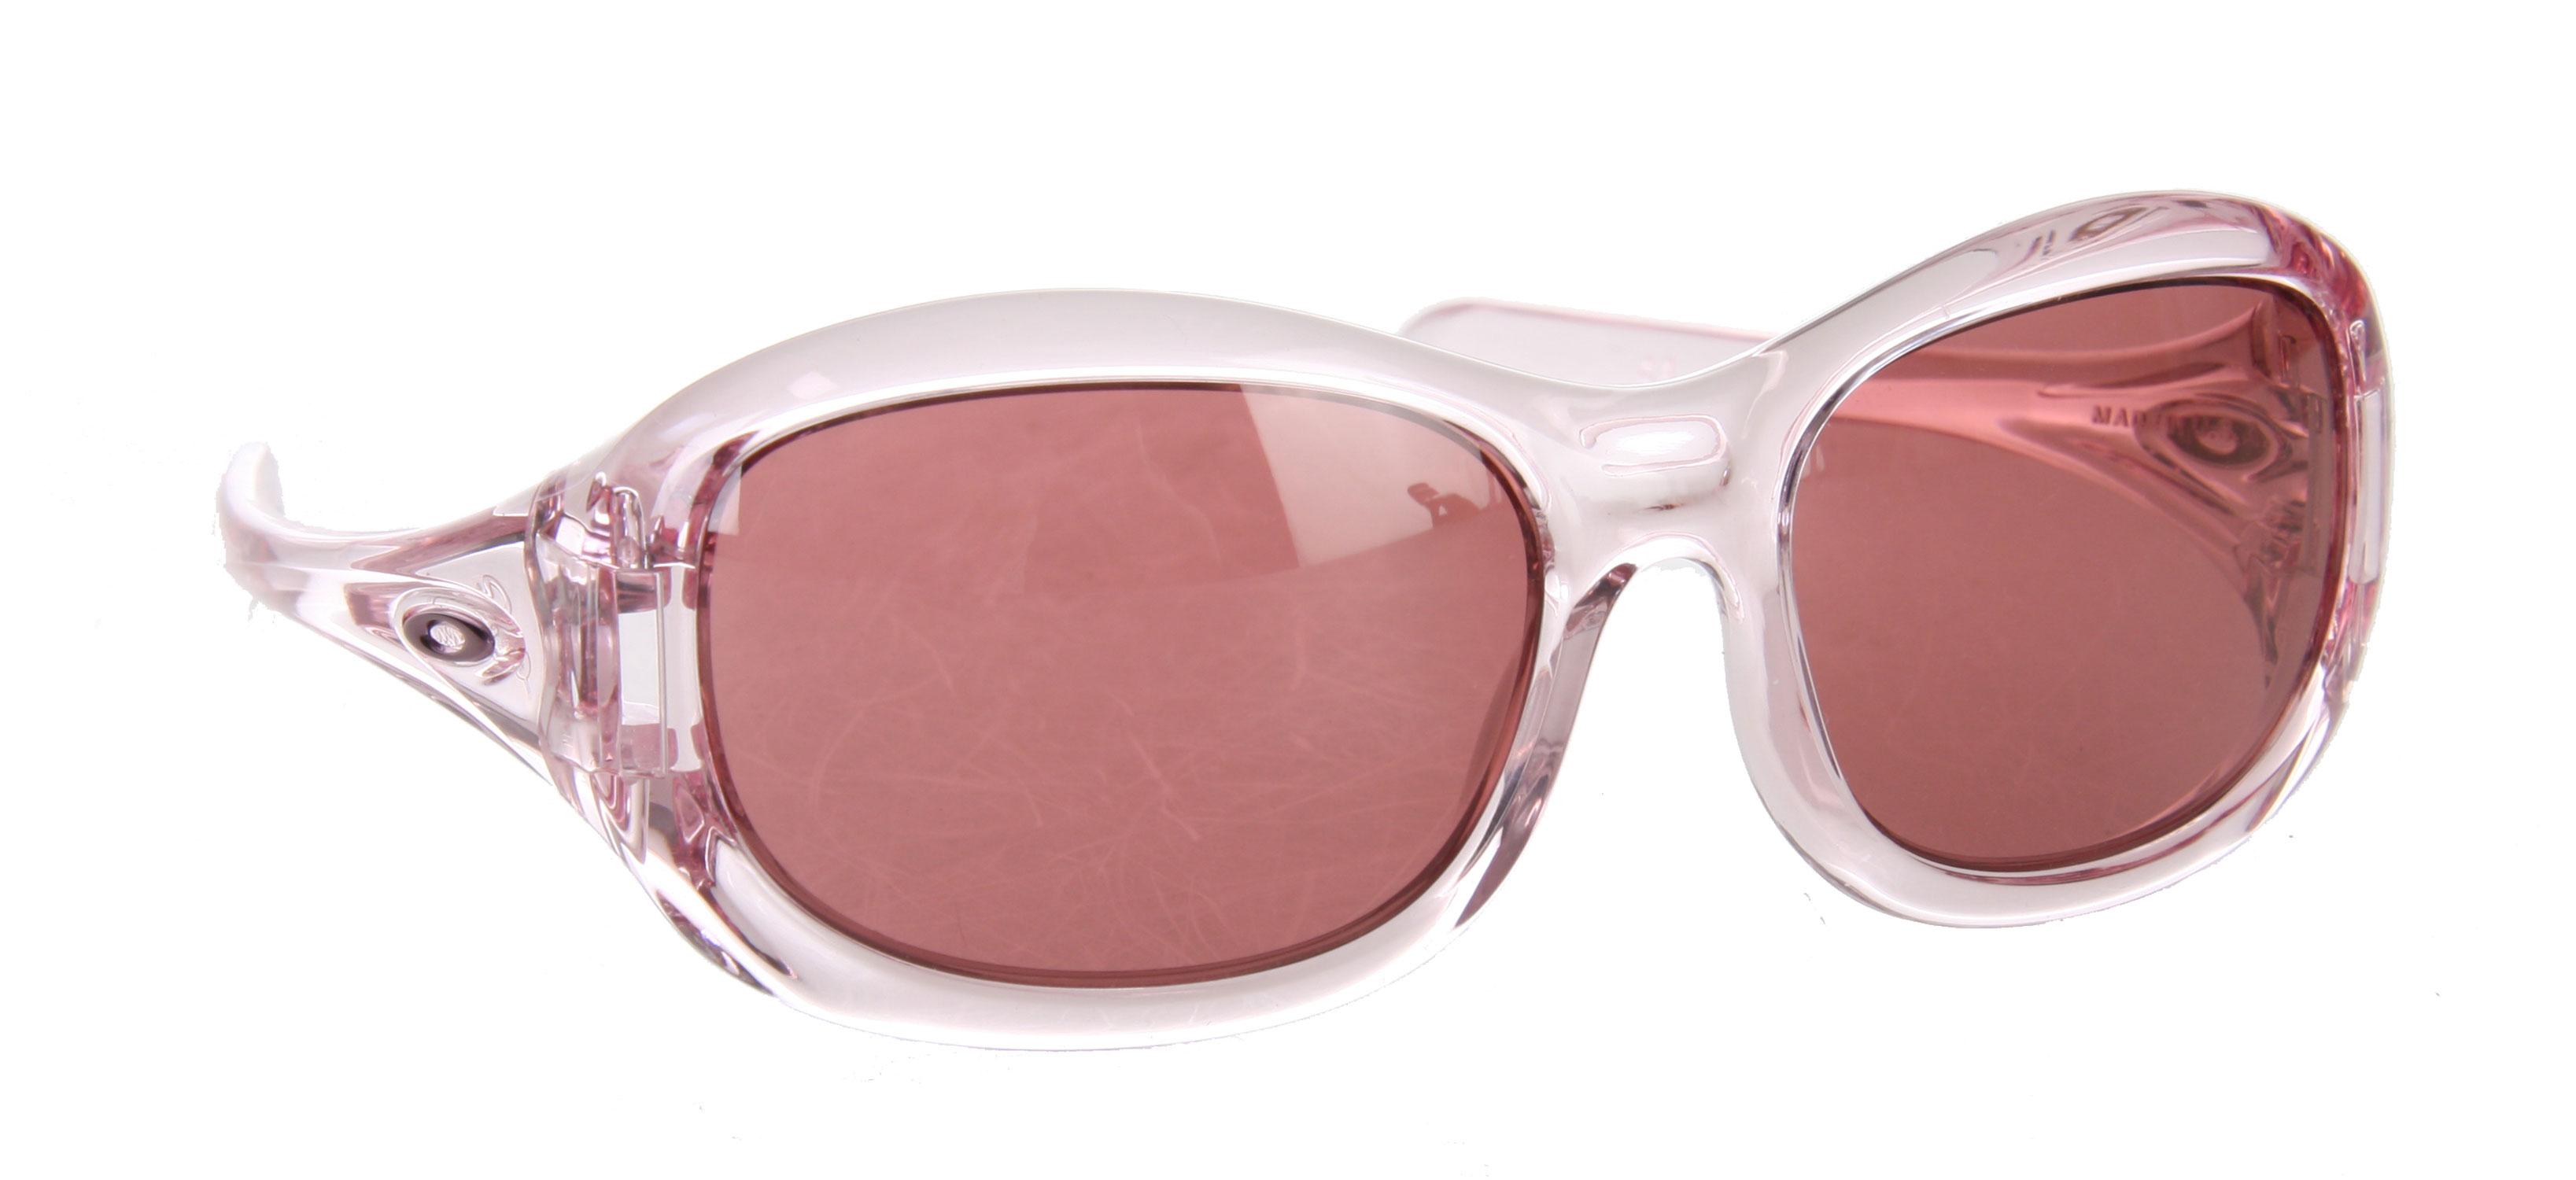 96470531670 Oakley Visionary Lenses Review. Oakley G20 Lens Review « Heritage Malta